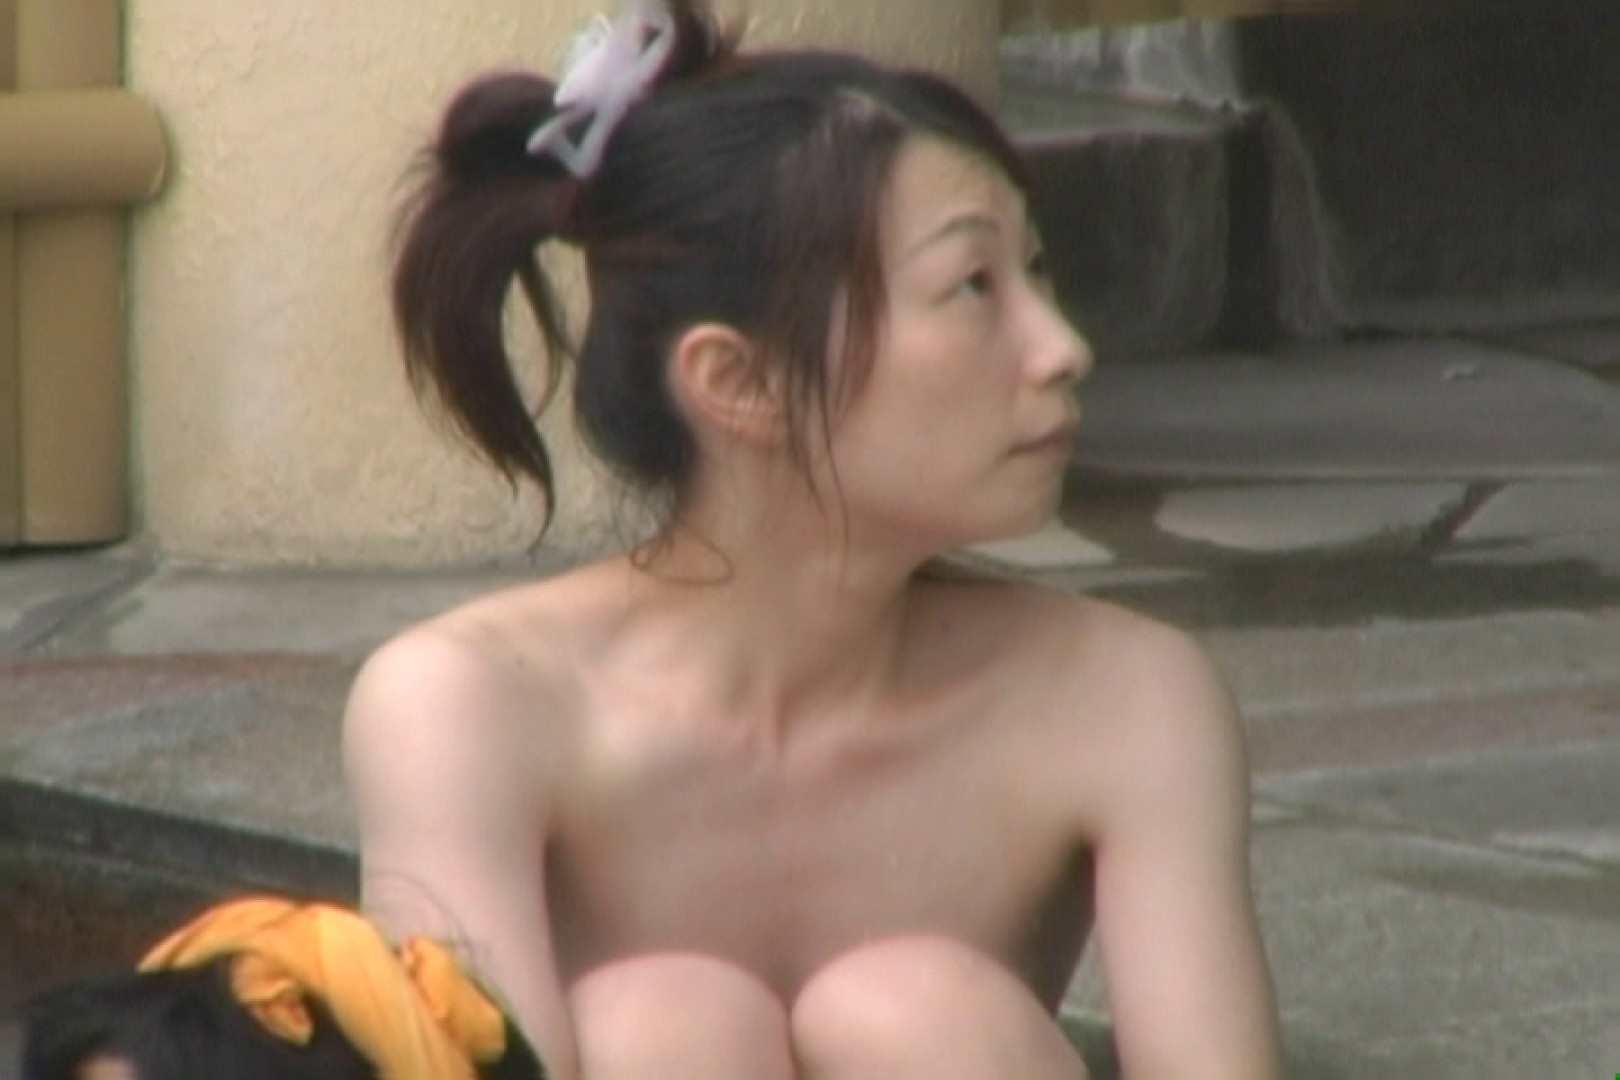 Aquaな露天風呂Vol.615 0   0  36連発 9